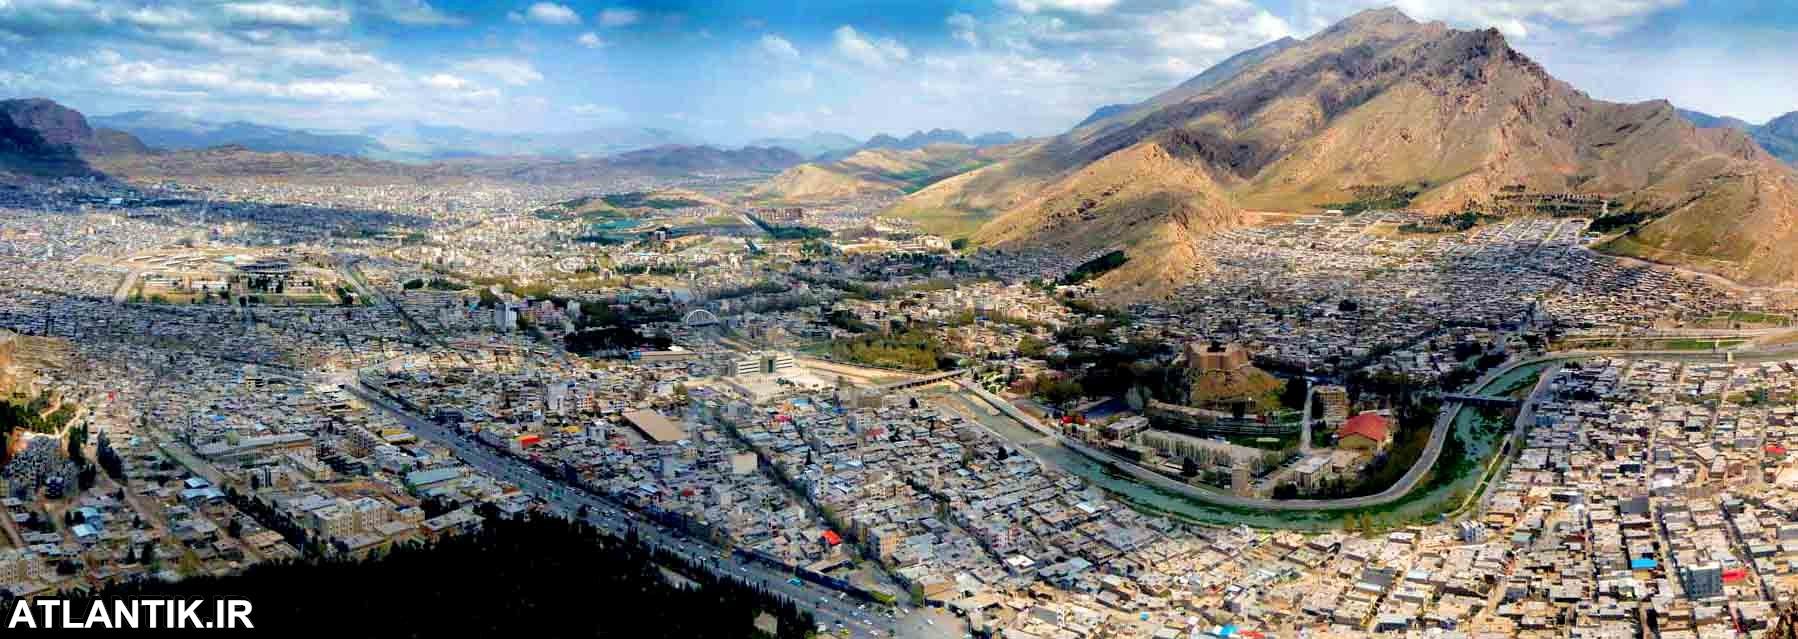 عکس هوایی شهر خرم آباد لرستان